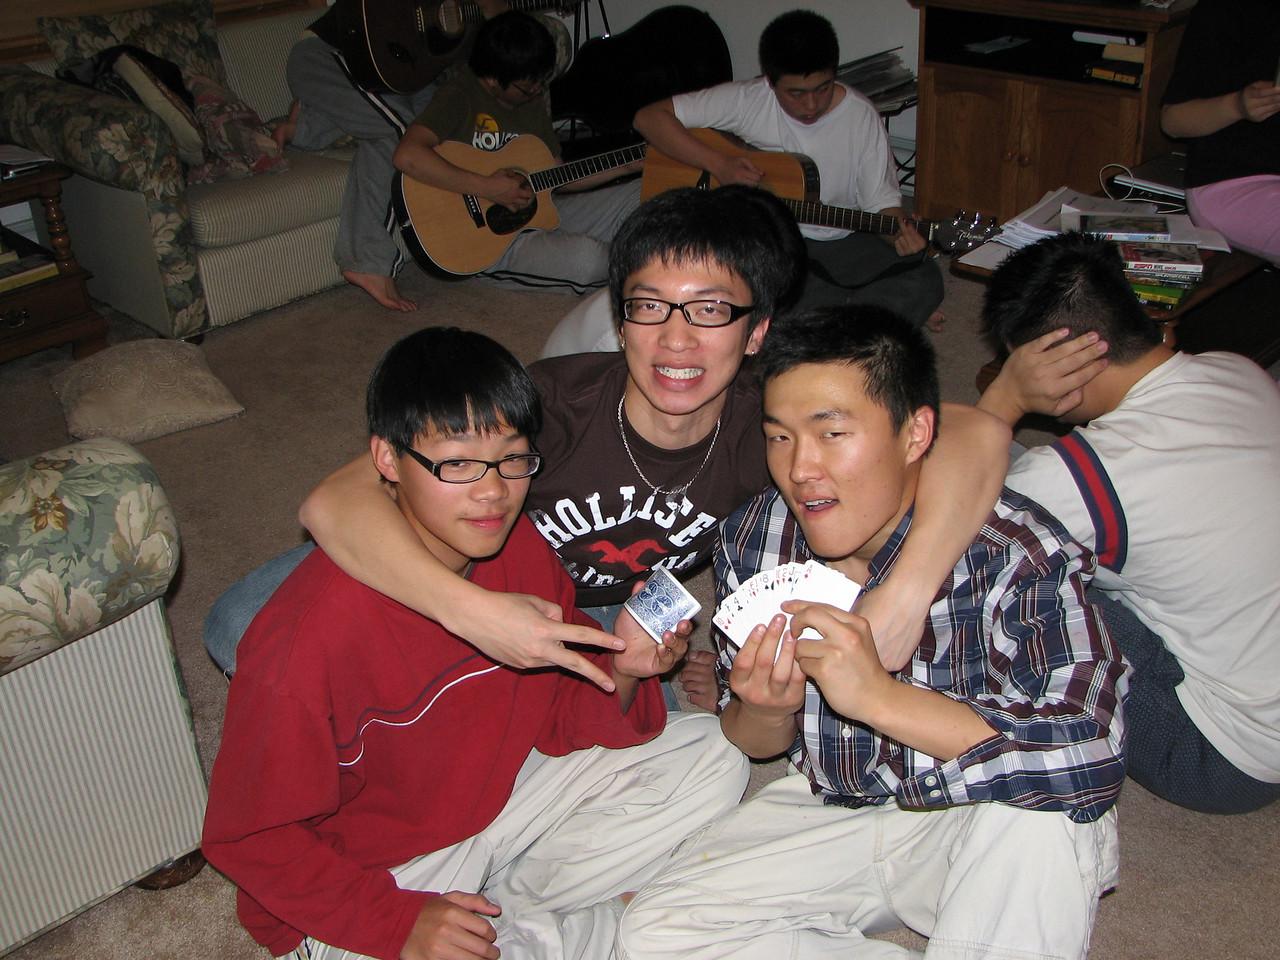 2006 12 22 Fri - Jeremy Hsu, Jimmy Lee, & Ted Hong